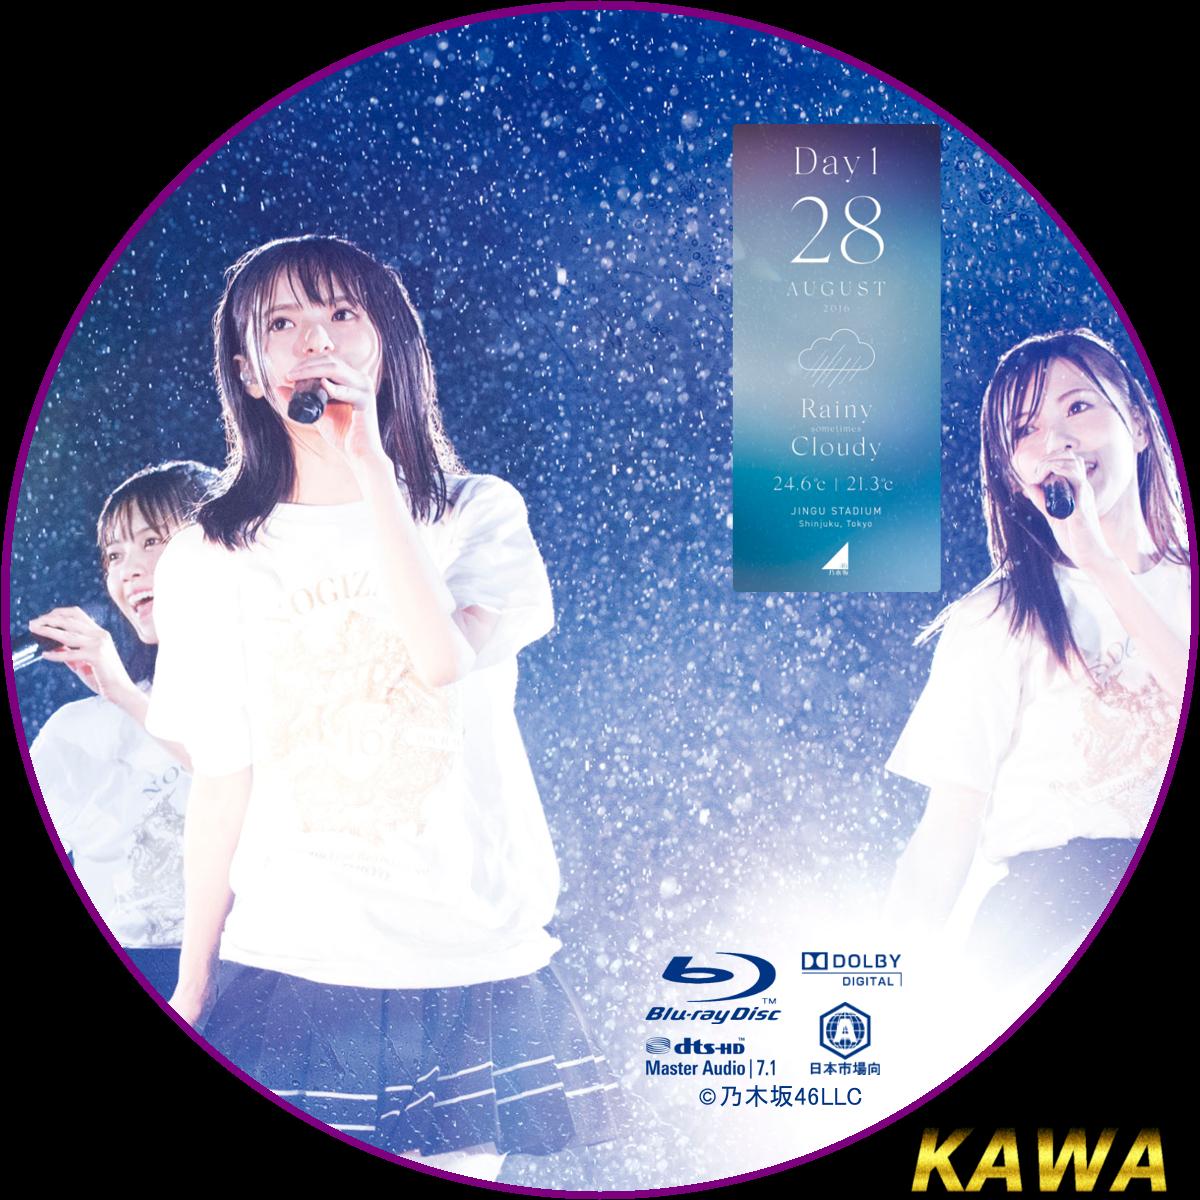 「4th year birthday live dvd&Blu-ray」の画像検索結果